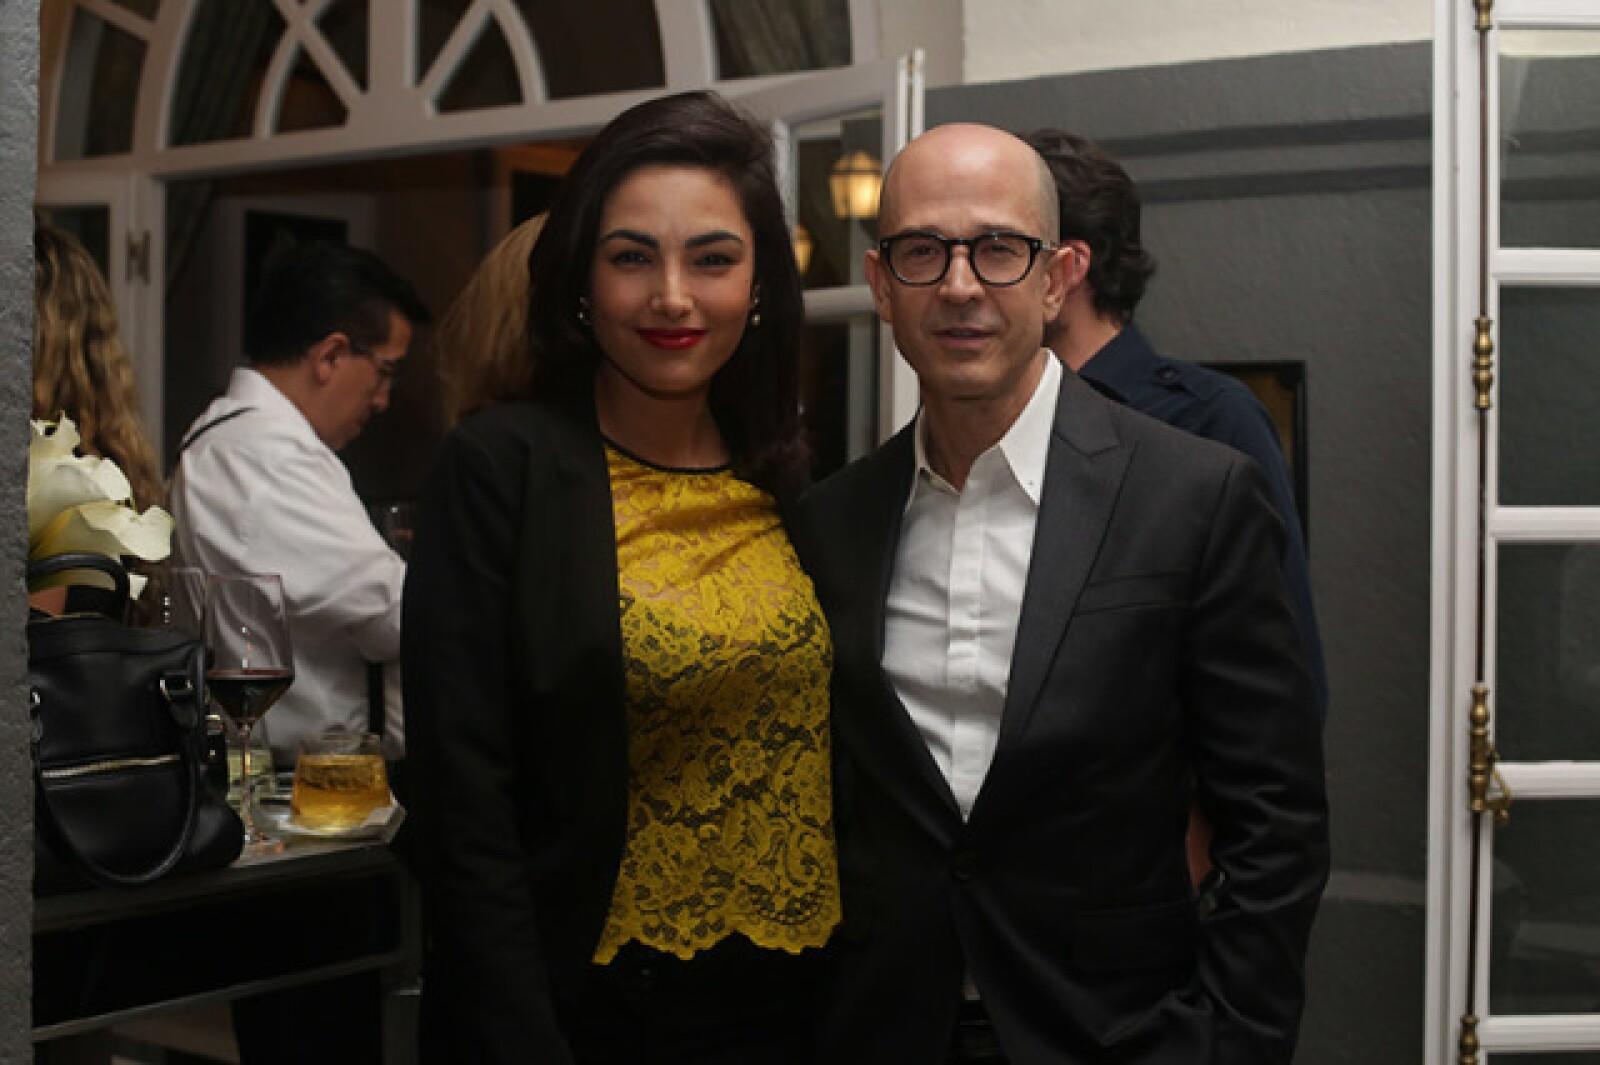 Itahisa Machado y Francisco Herrera